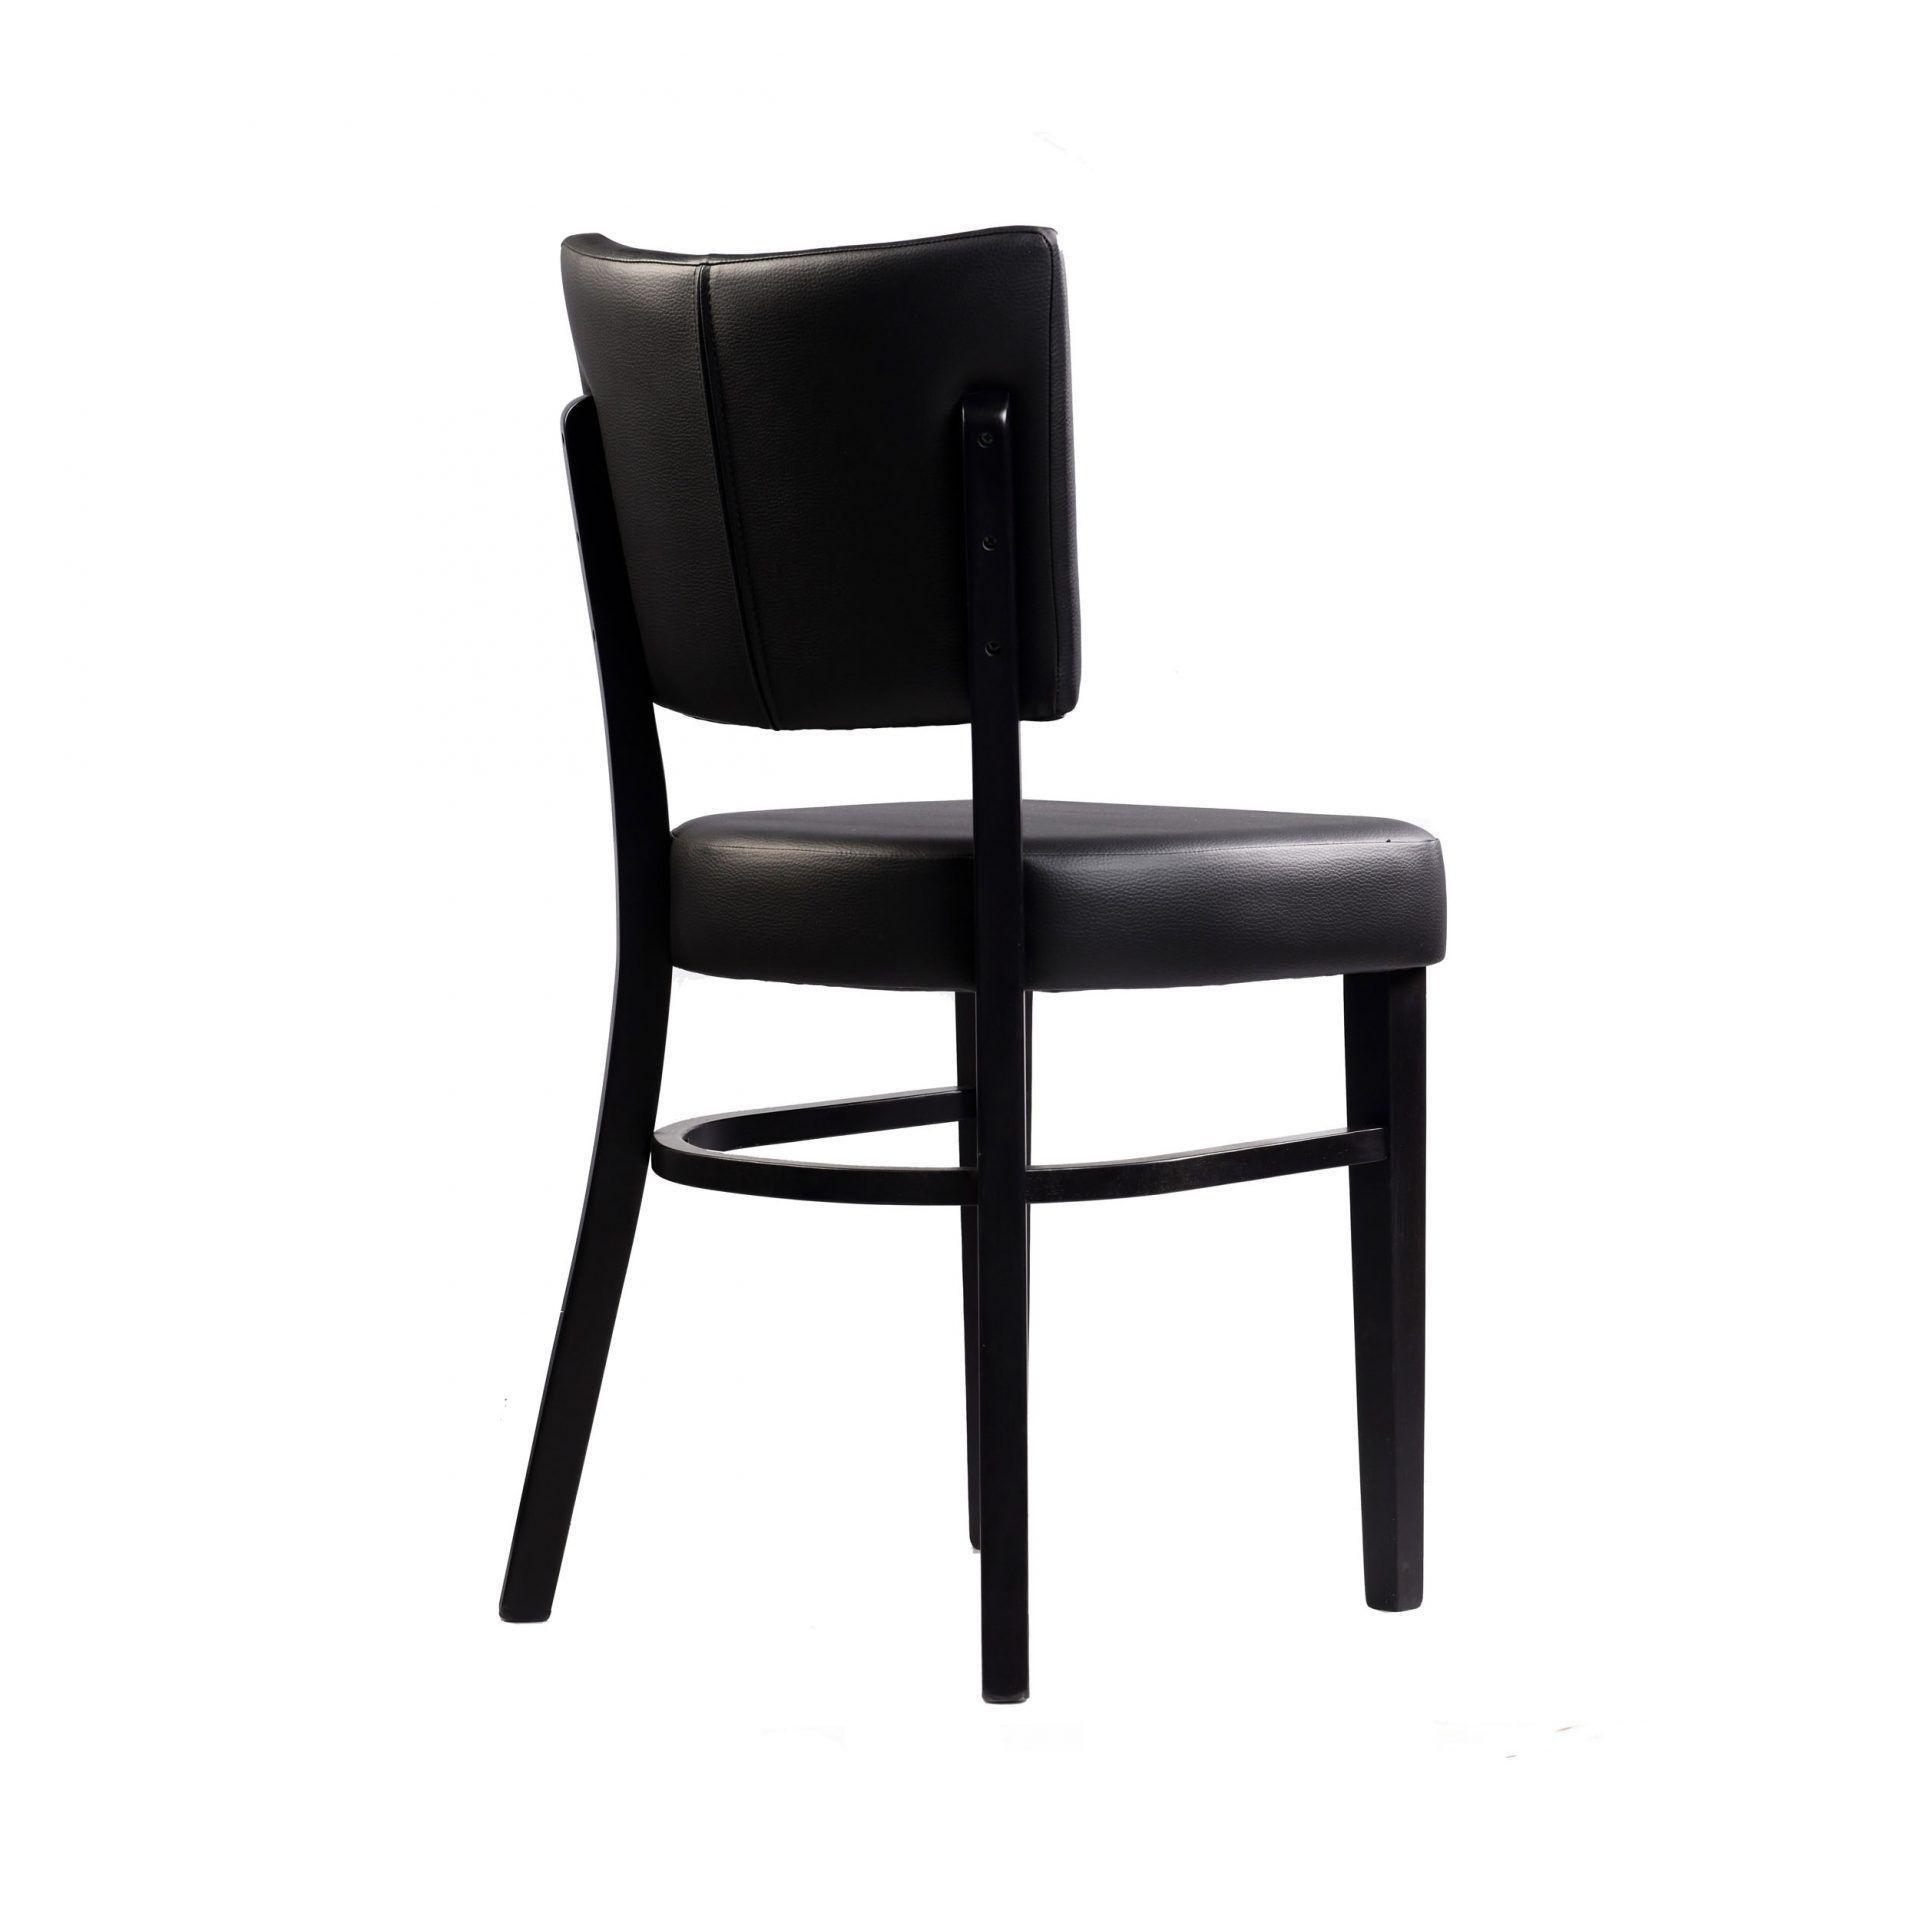 memphis chair black vinyl seat and backrest wenge frame back right